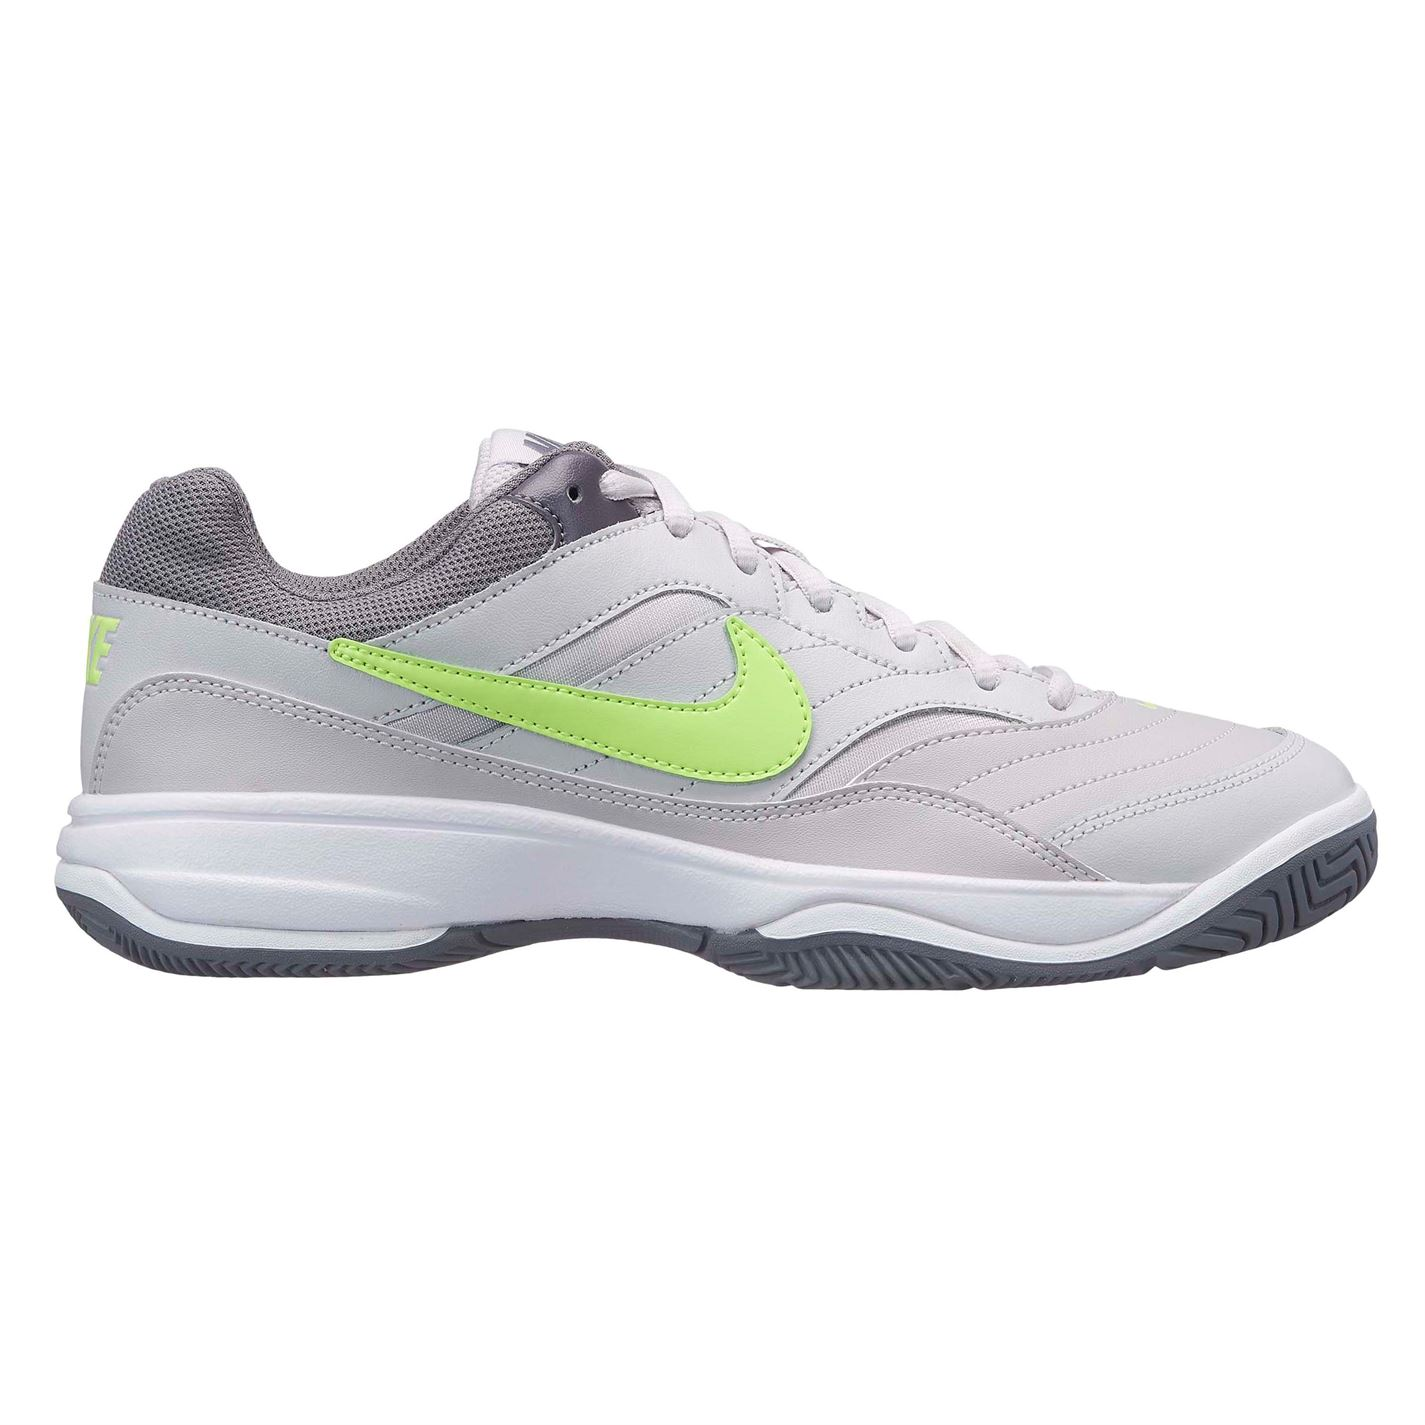 b73b46b68eb Dámska tenisová obuv Nike Court Lite Ladies Tennis Shoes - Glami.sk